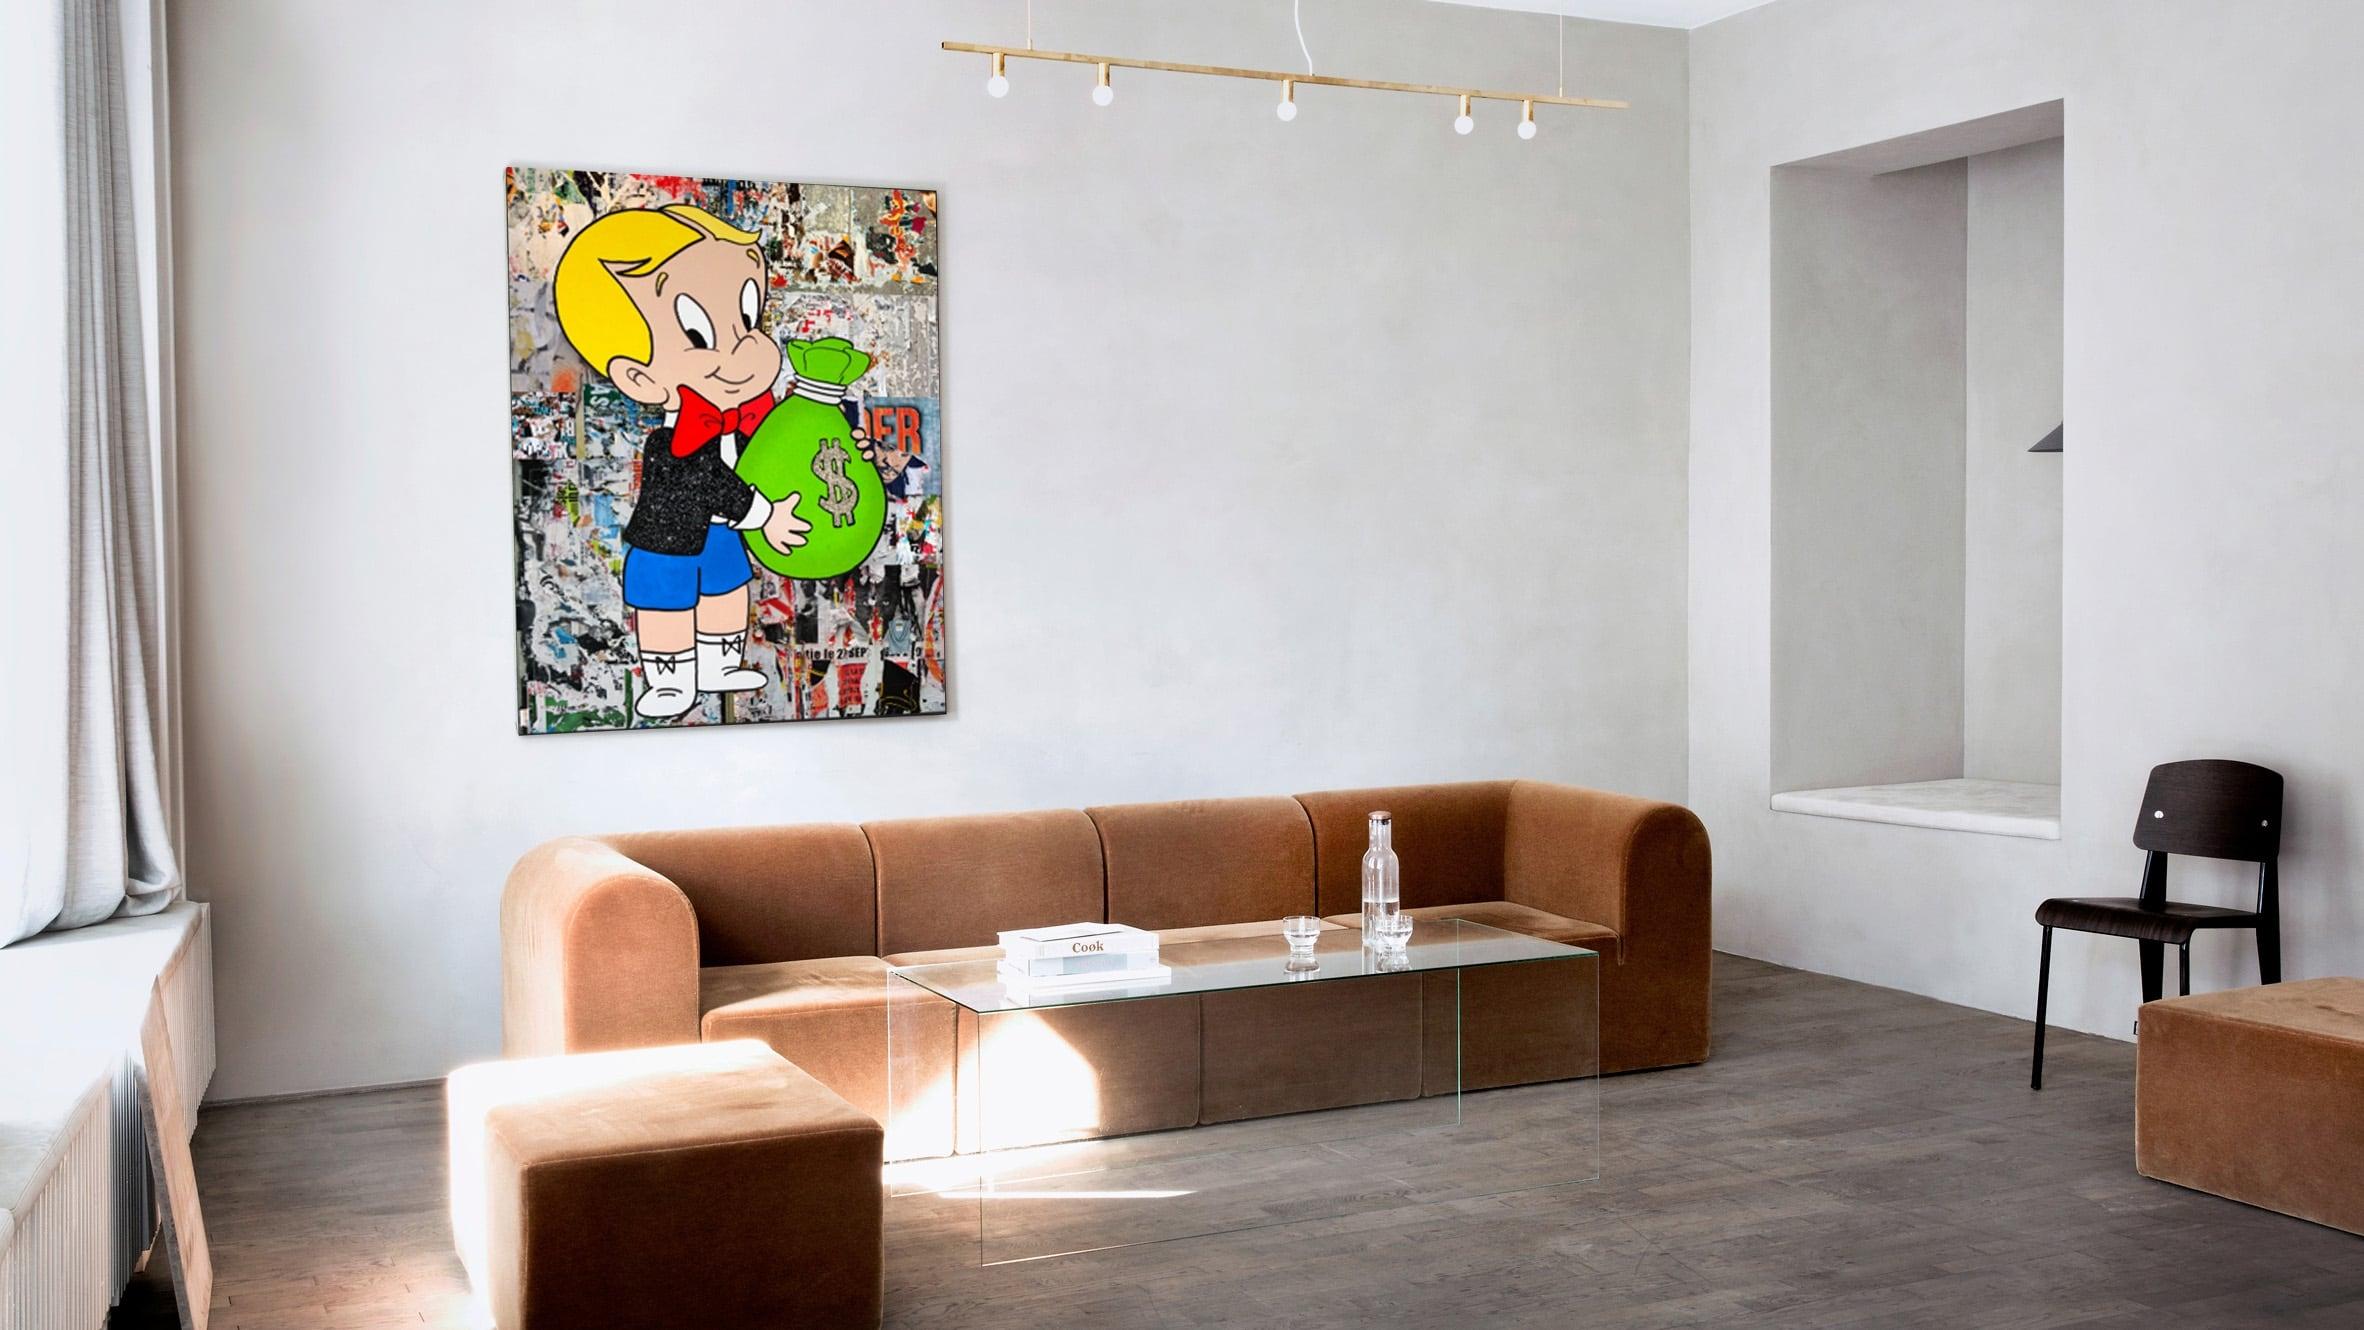 Richie rich modern canva decoration for a unique interior